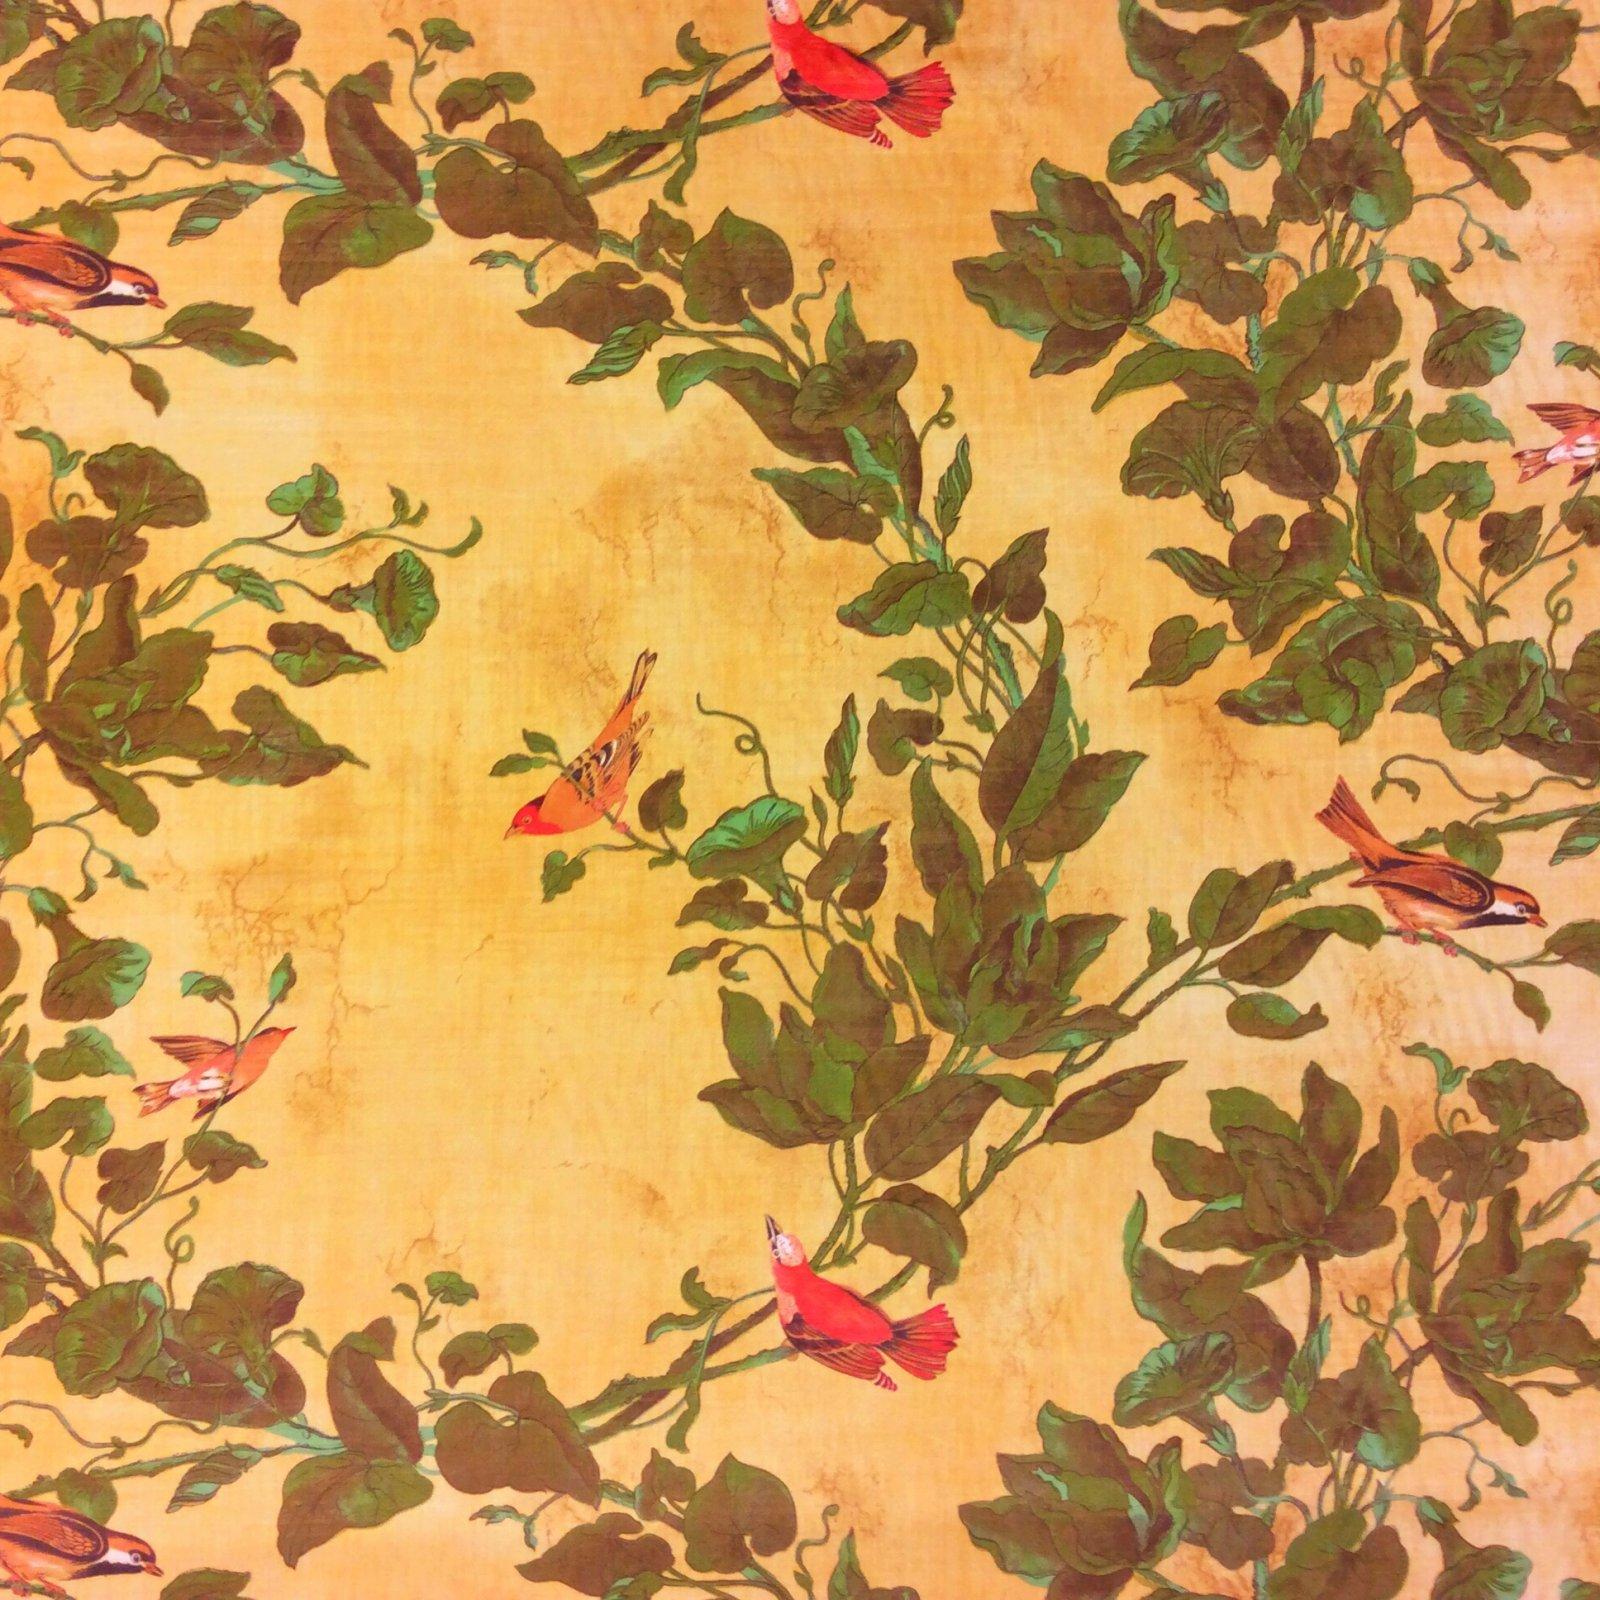 Windsong Cognac Watercolor Songbirds Beautiful Illustrated Bird Cotton Fabric Drapery Fabric HD607C